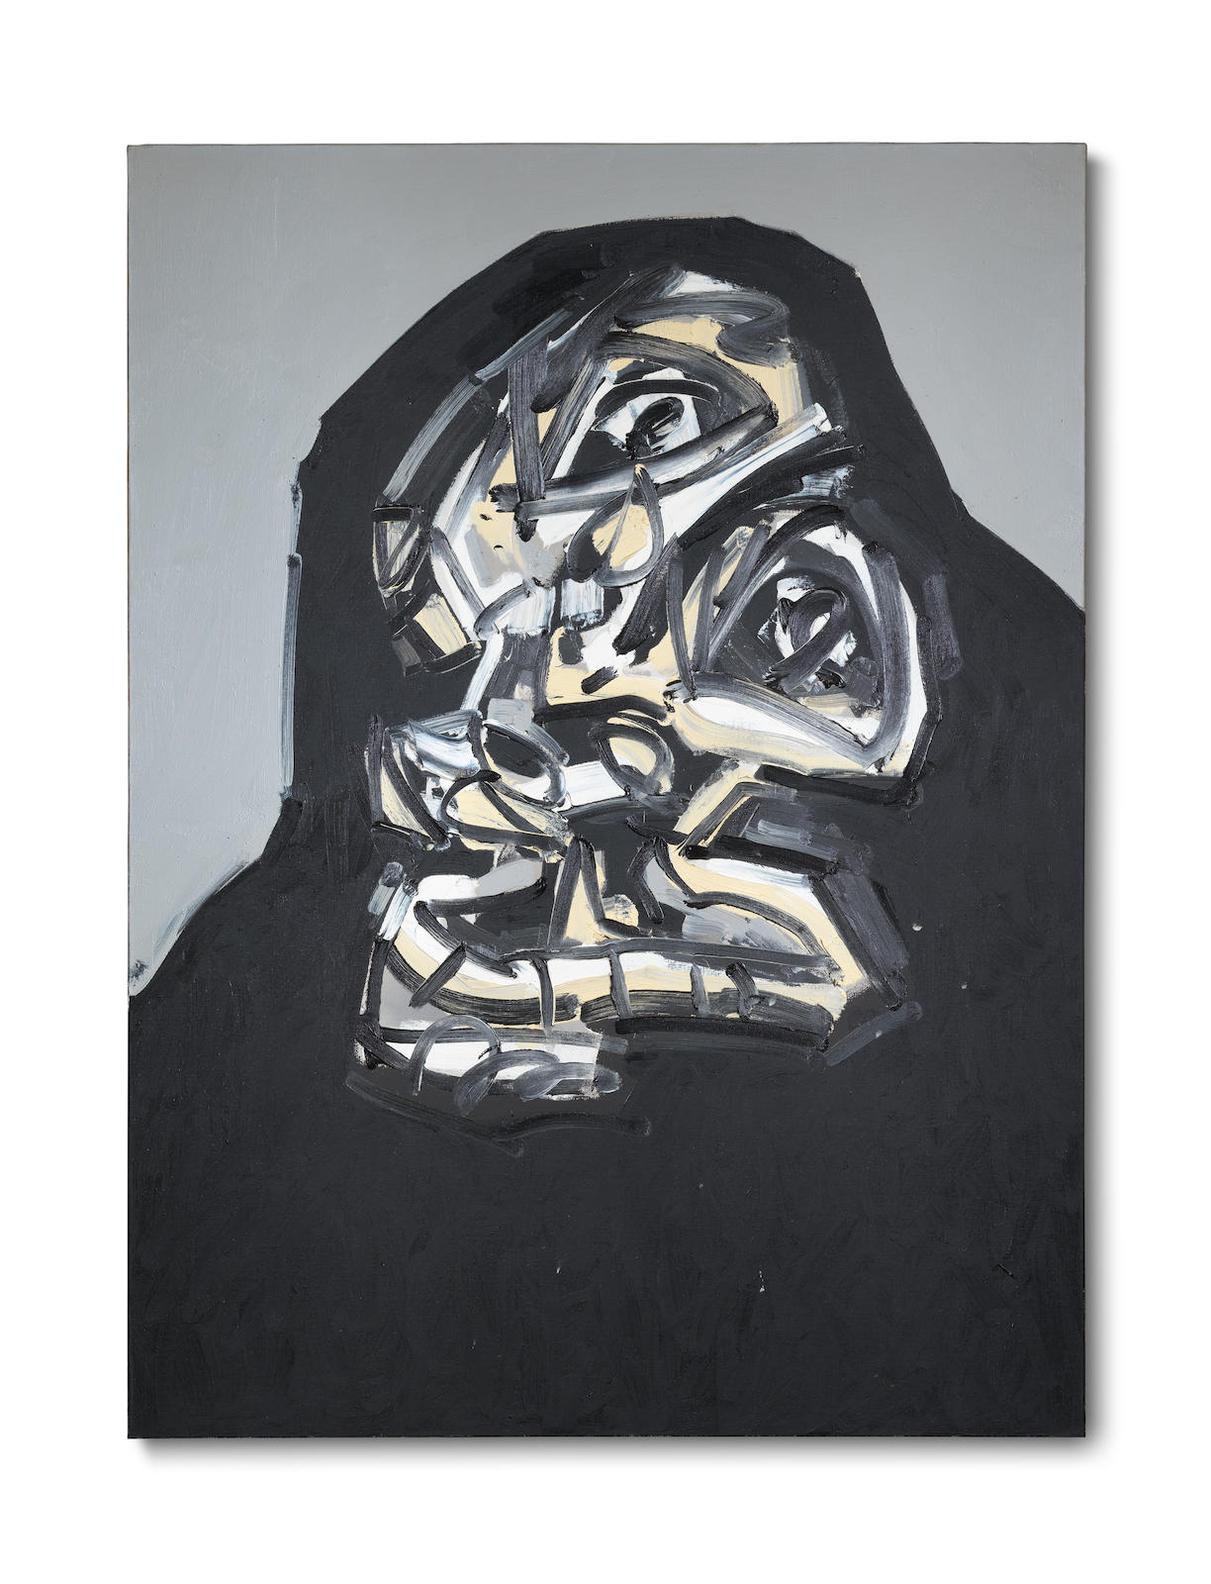 Antonio Saura-Portrait No. 6-87-1987